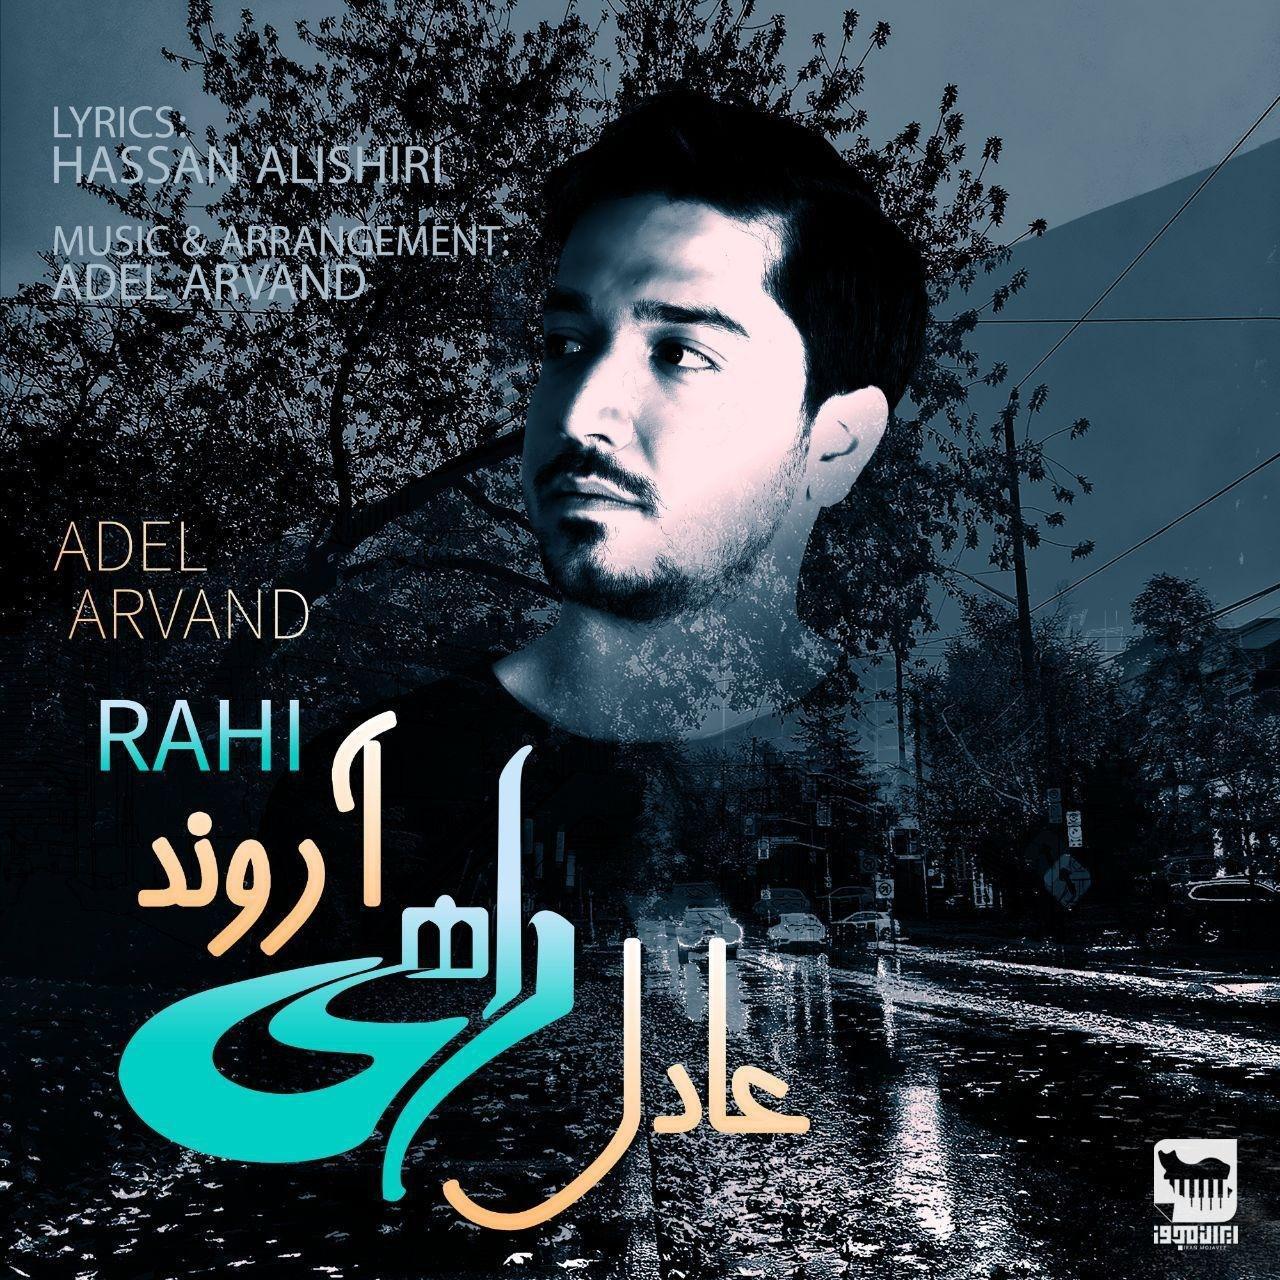 Adel Arvand – Rahi